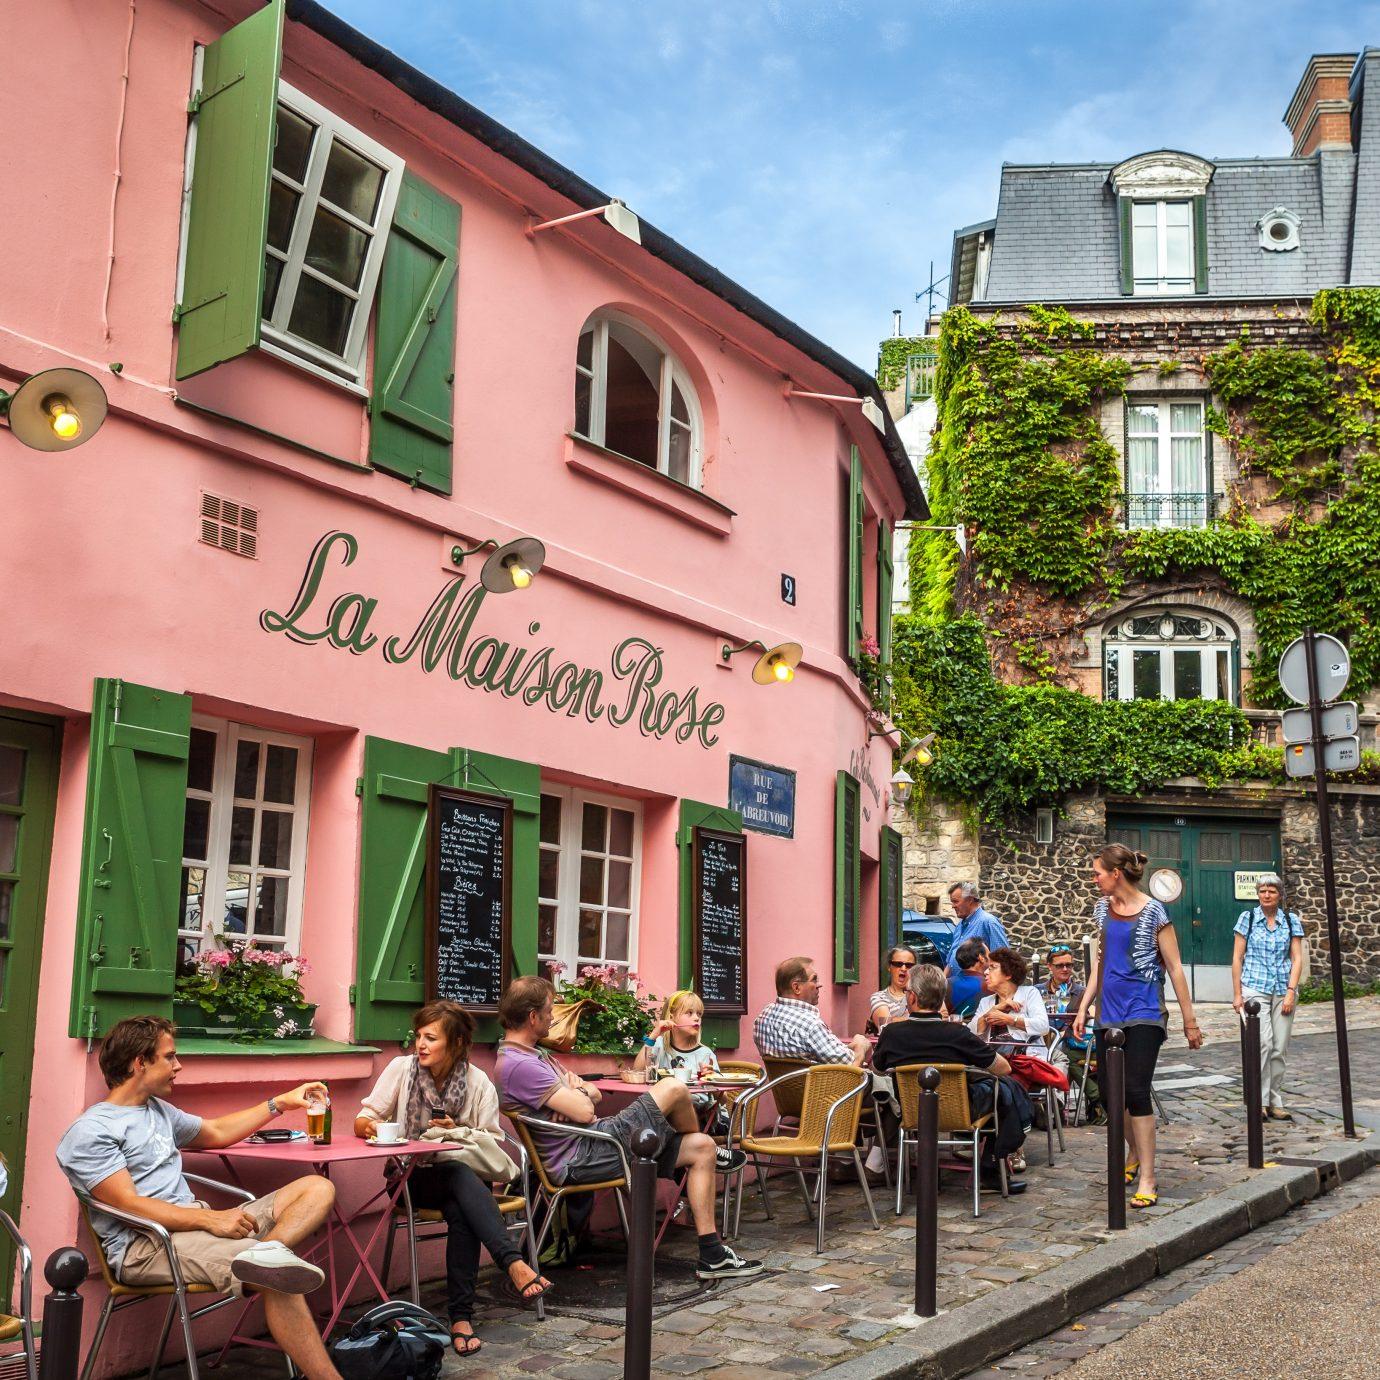 La Maison Rose in Paris